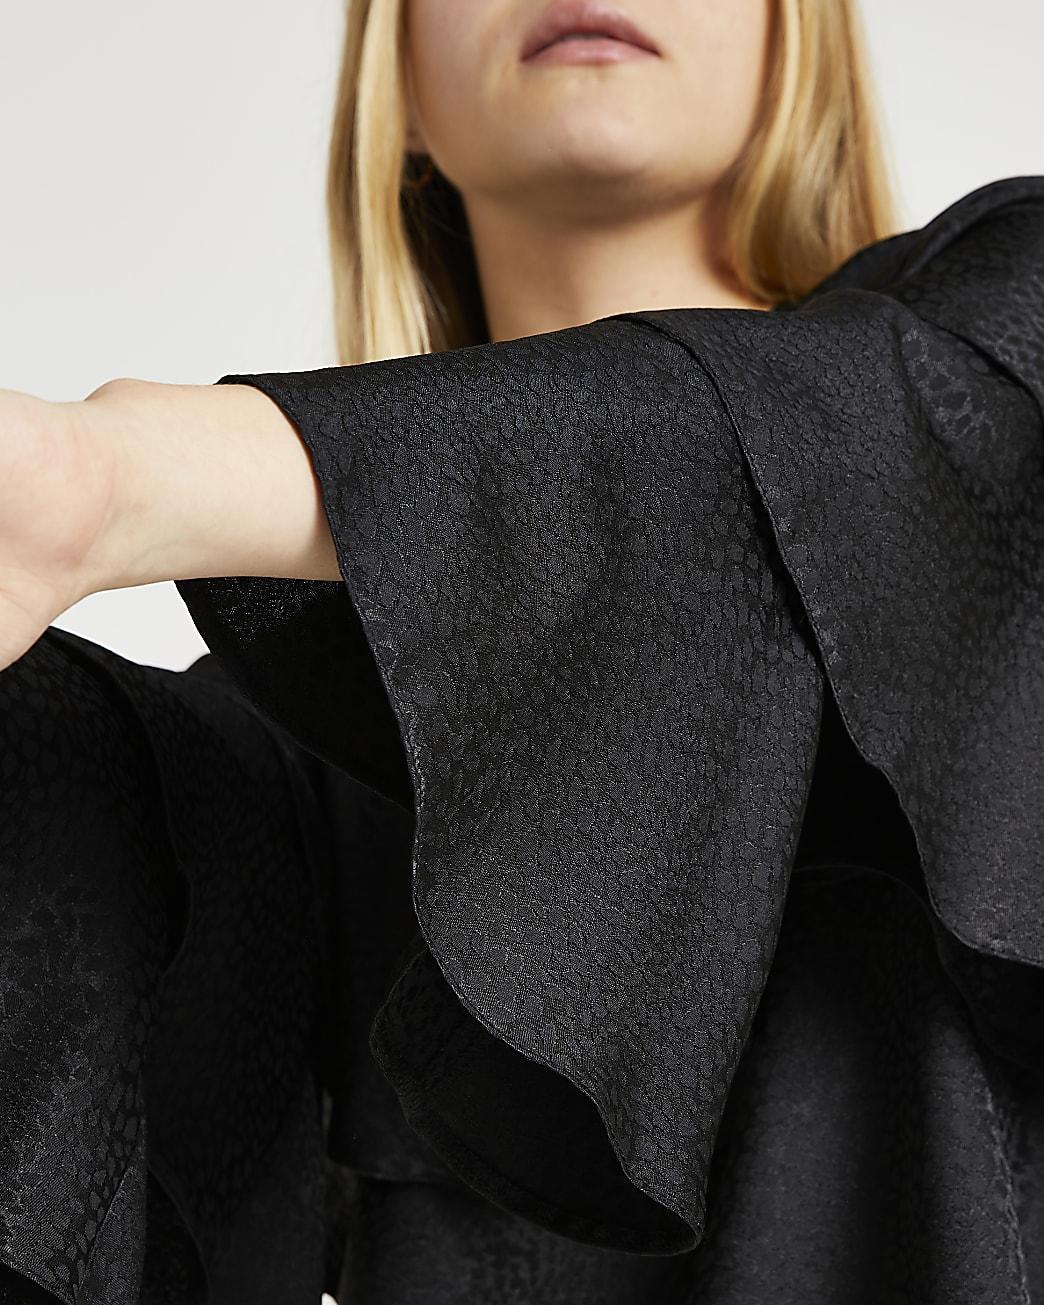 Black animal print ruffle blouse top